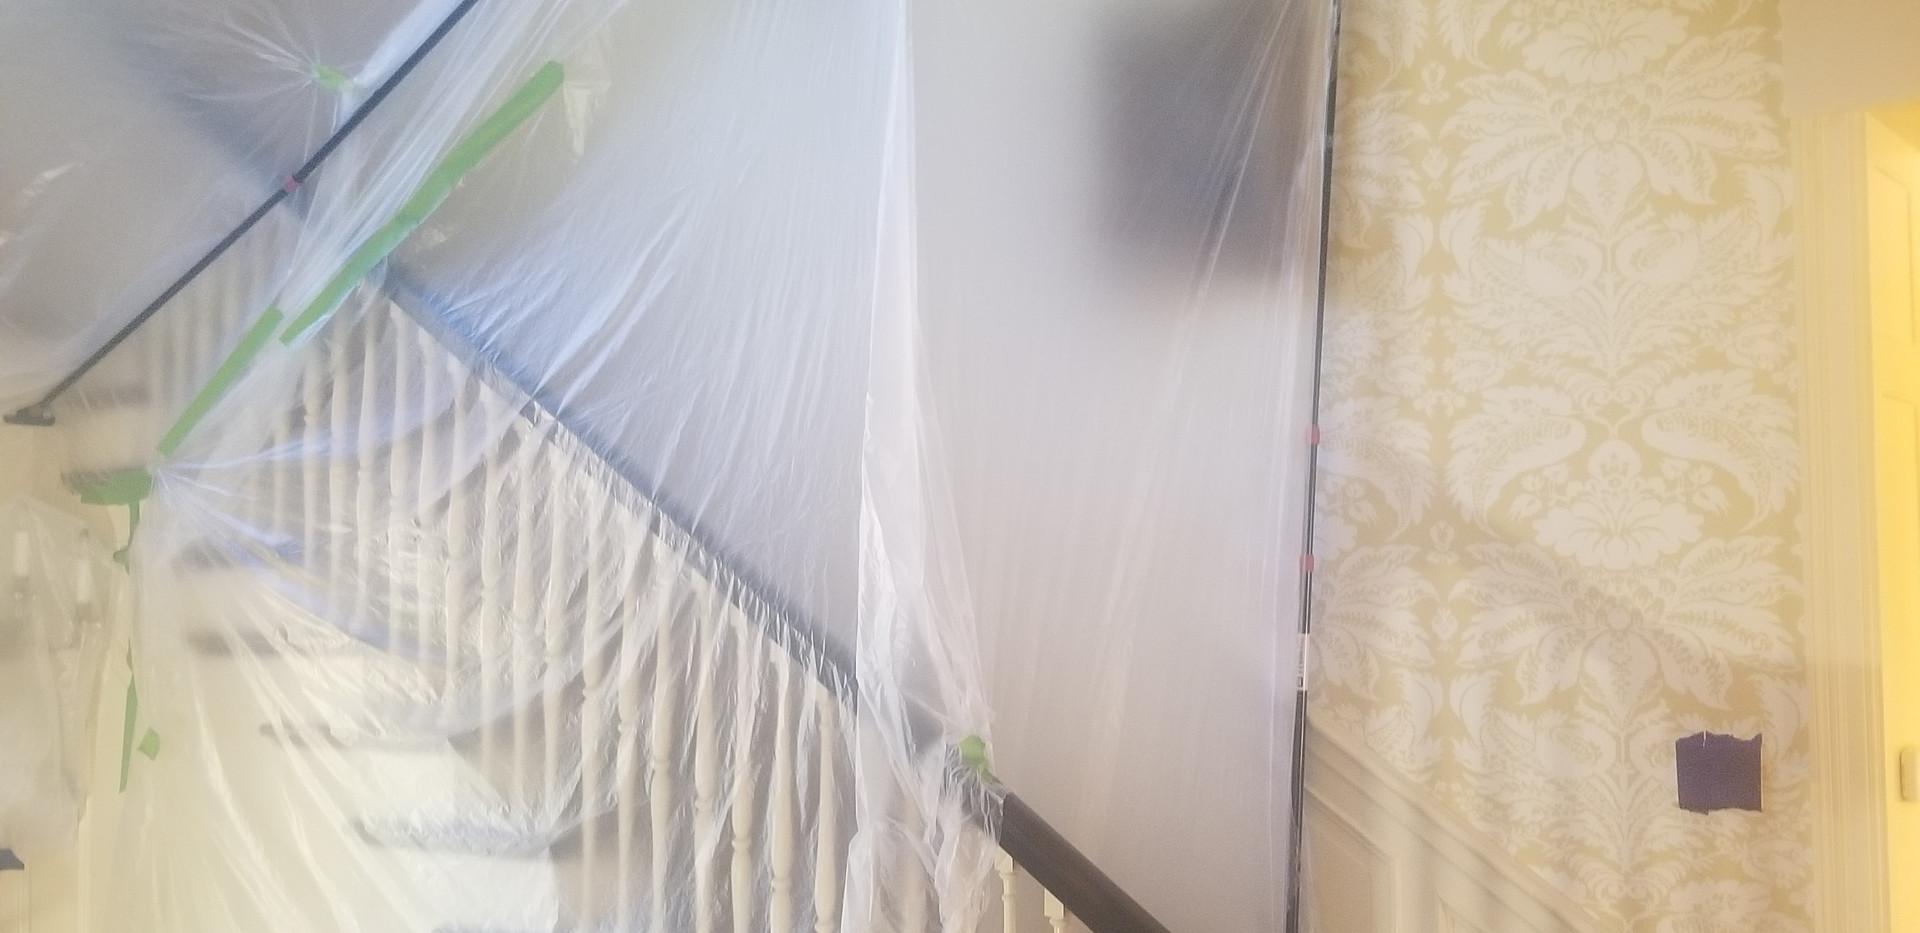 plastic containment to prevent dust